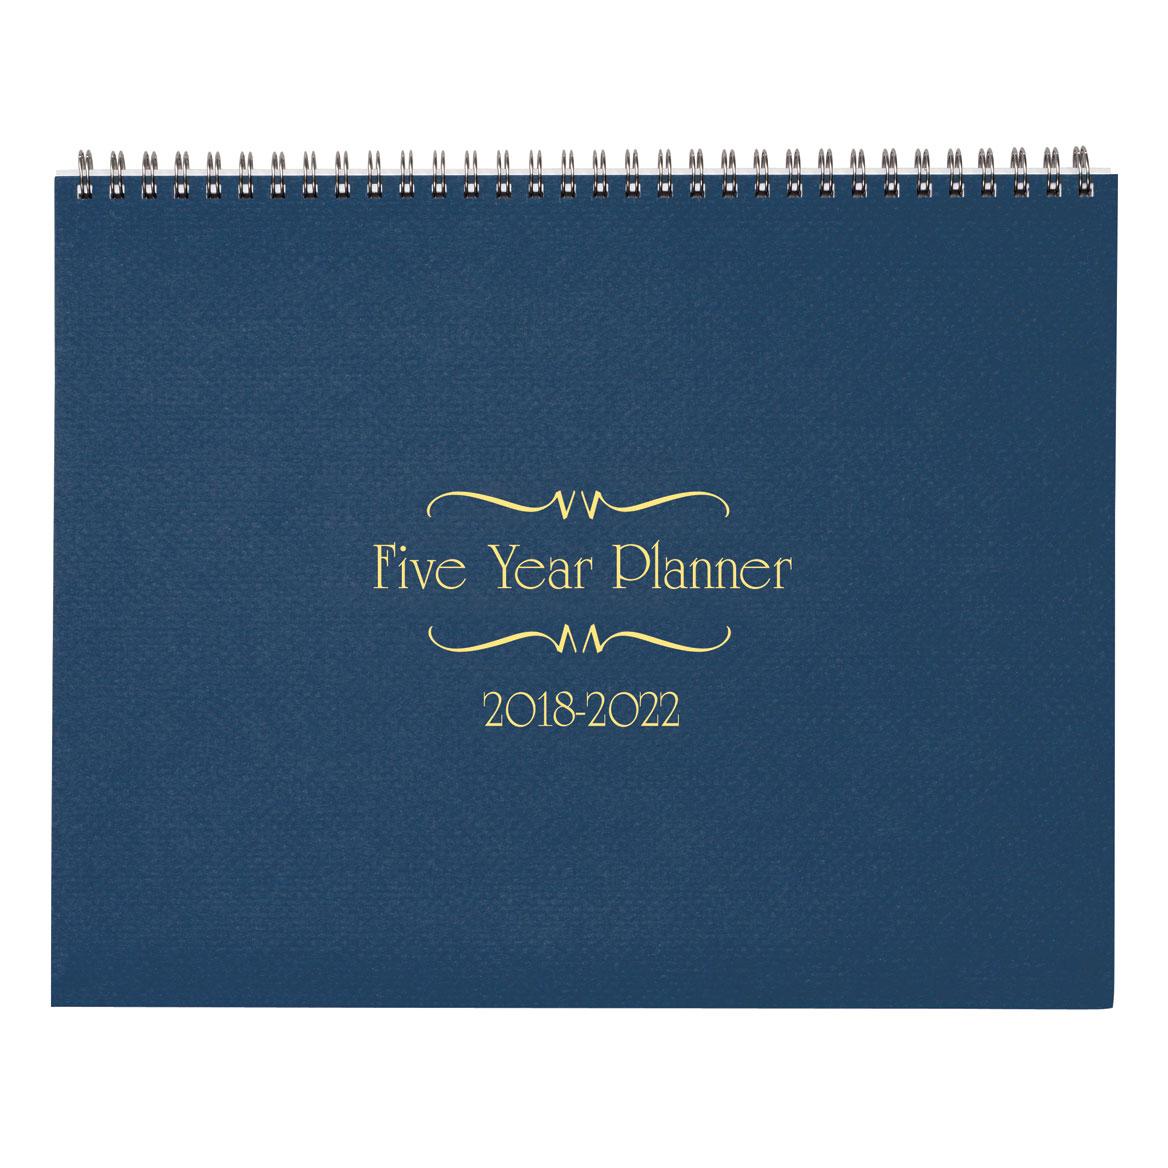 5 year calendar planner